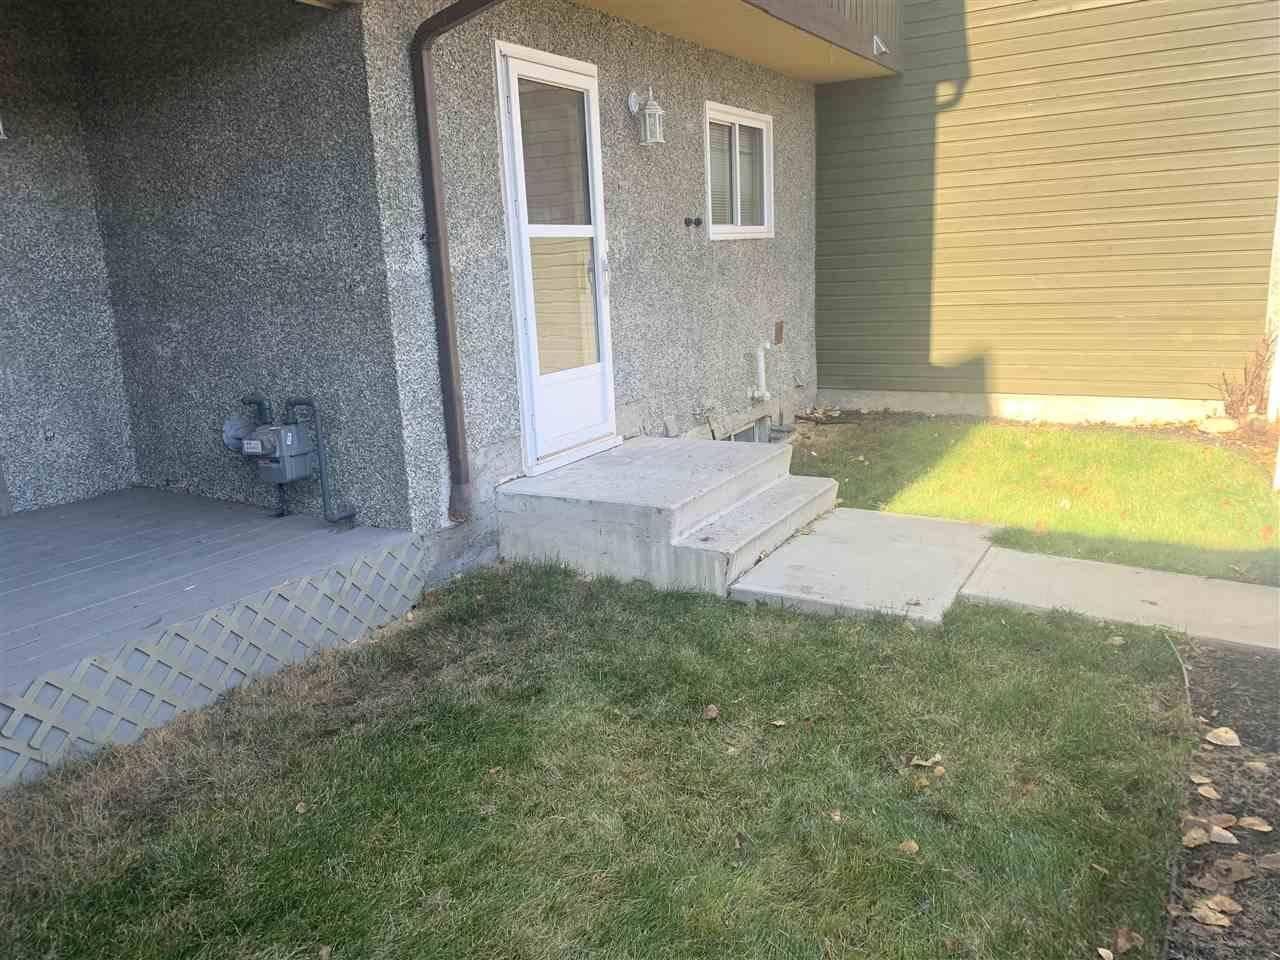 Townhouse for sale at 143 Kaskitayo Ct Nw Edmonton Alberta - MLS: E4183490